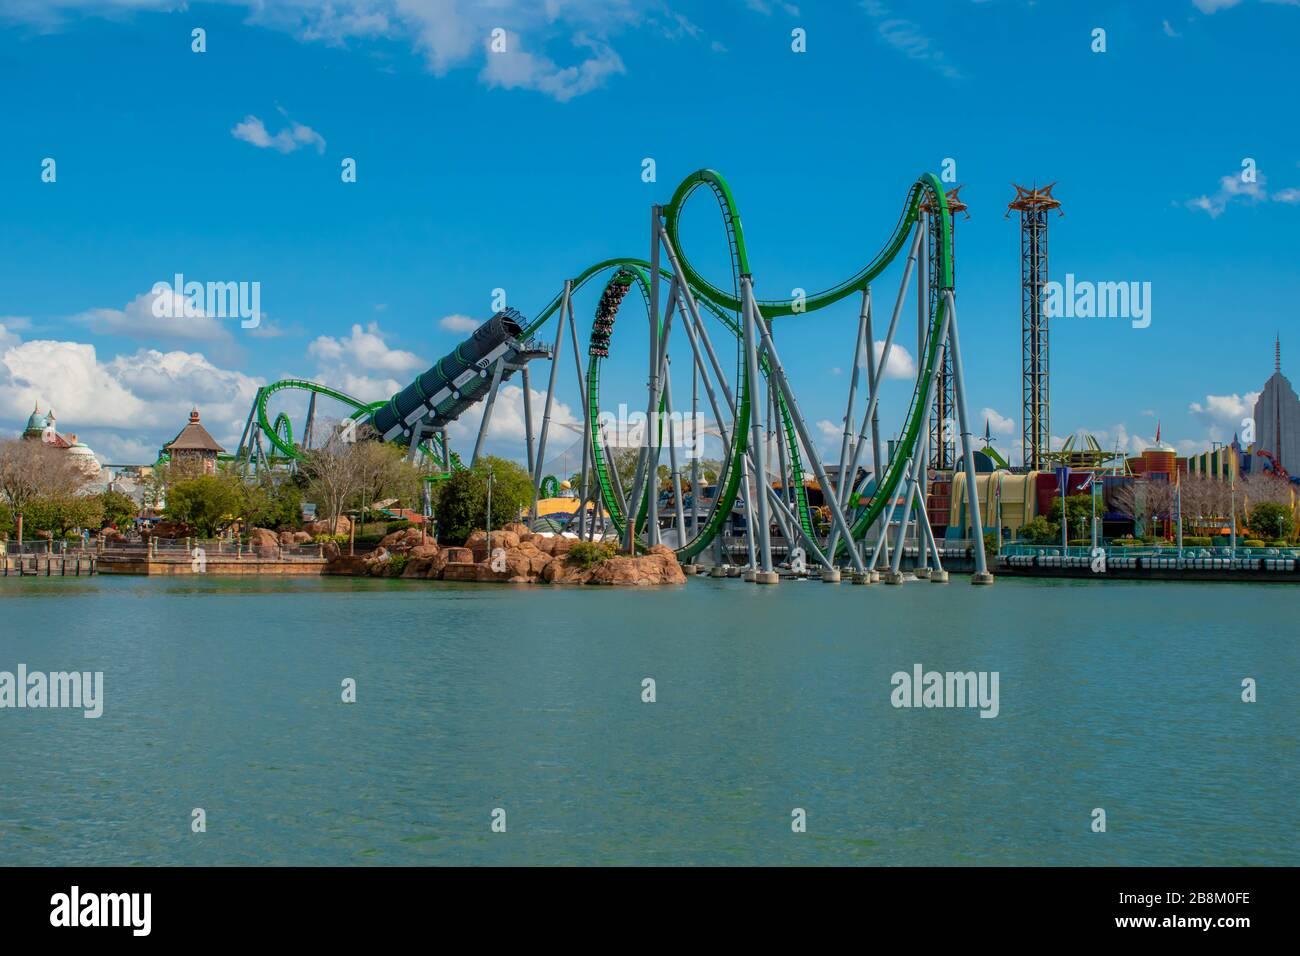 Orlando, Florida. March 02, 2019. People enjoying amazing The Incredible Hulk Coaster at Universals Islands of Adventure Stock Photo